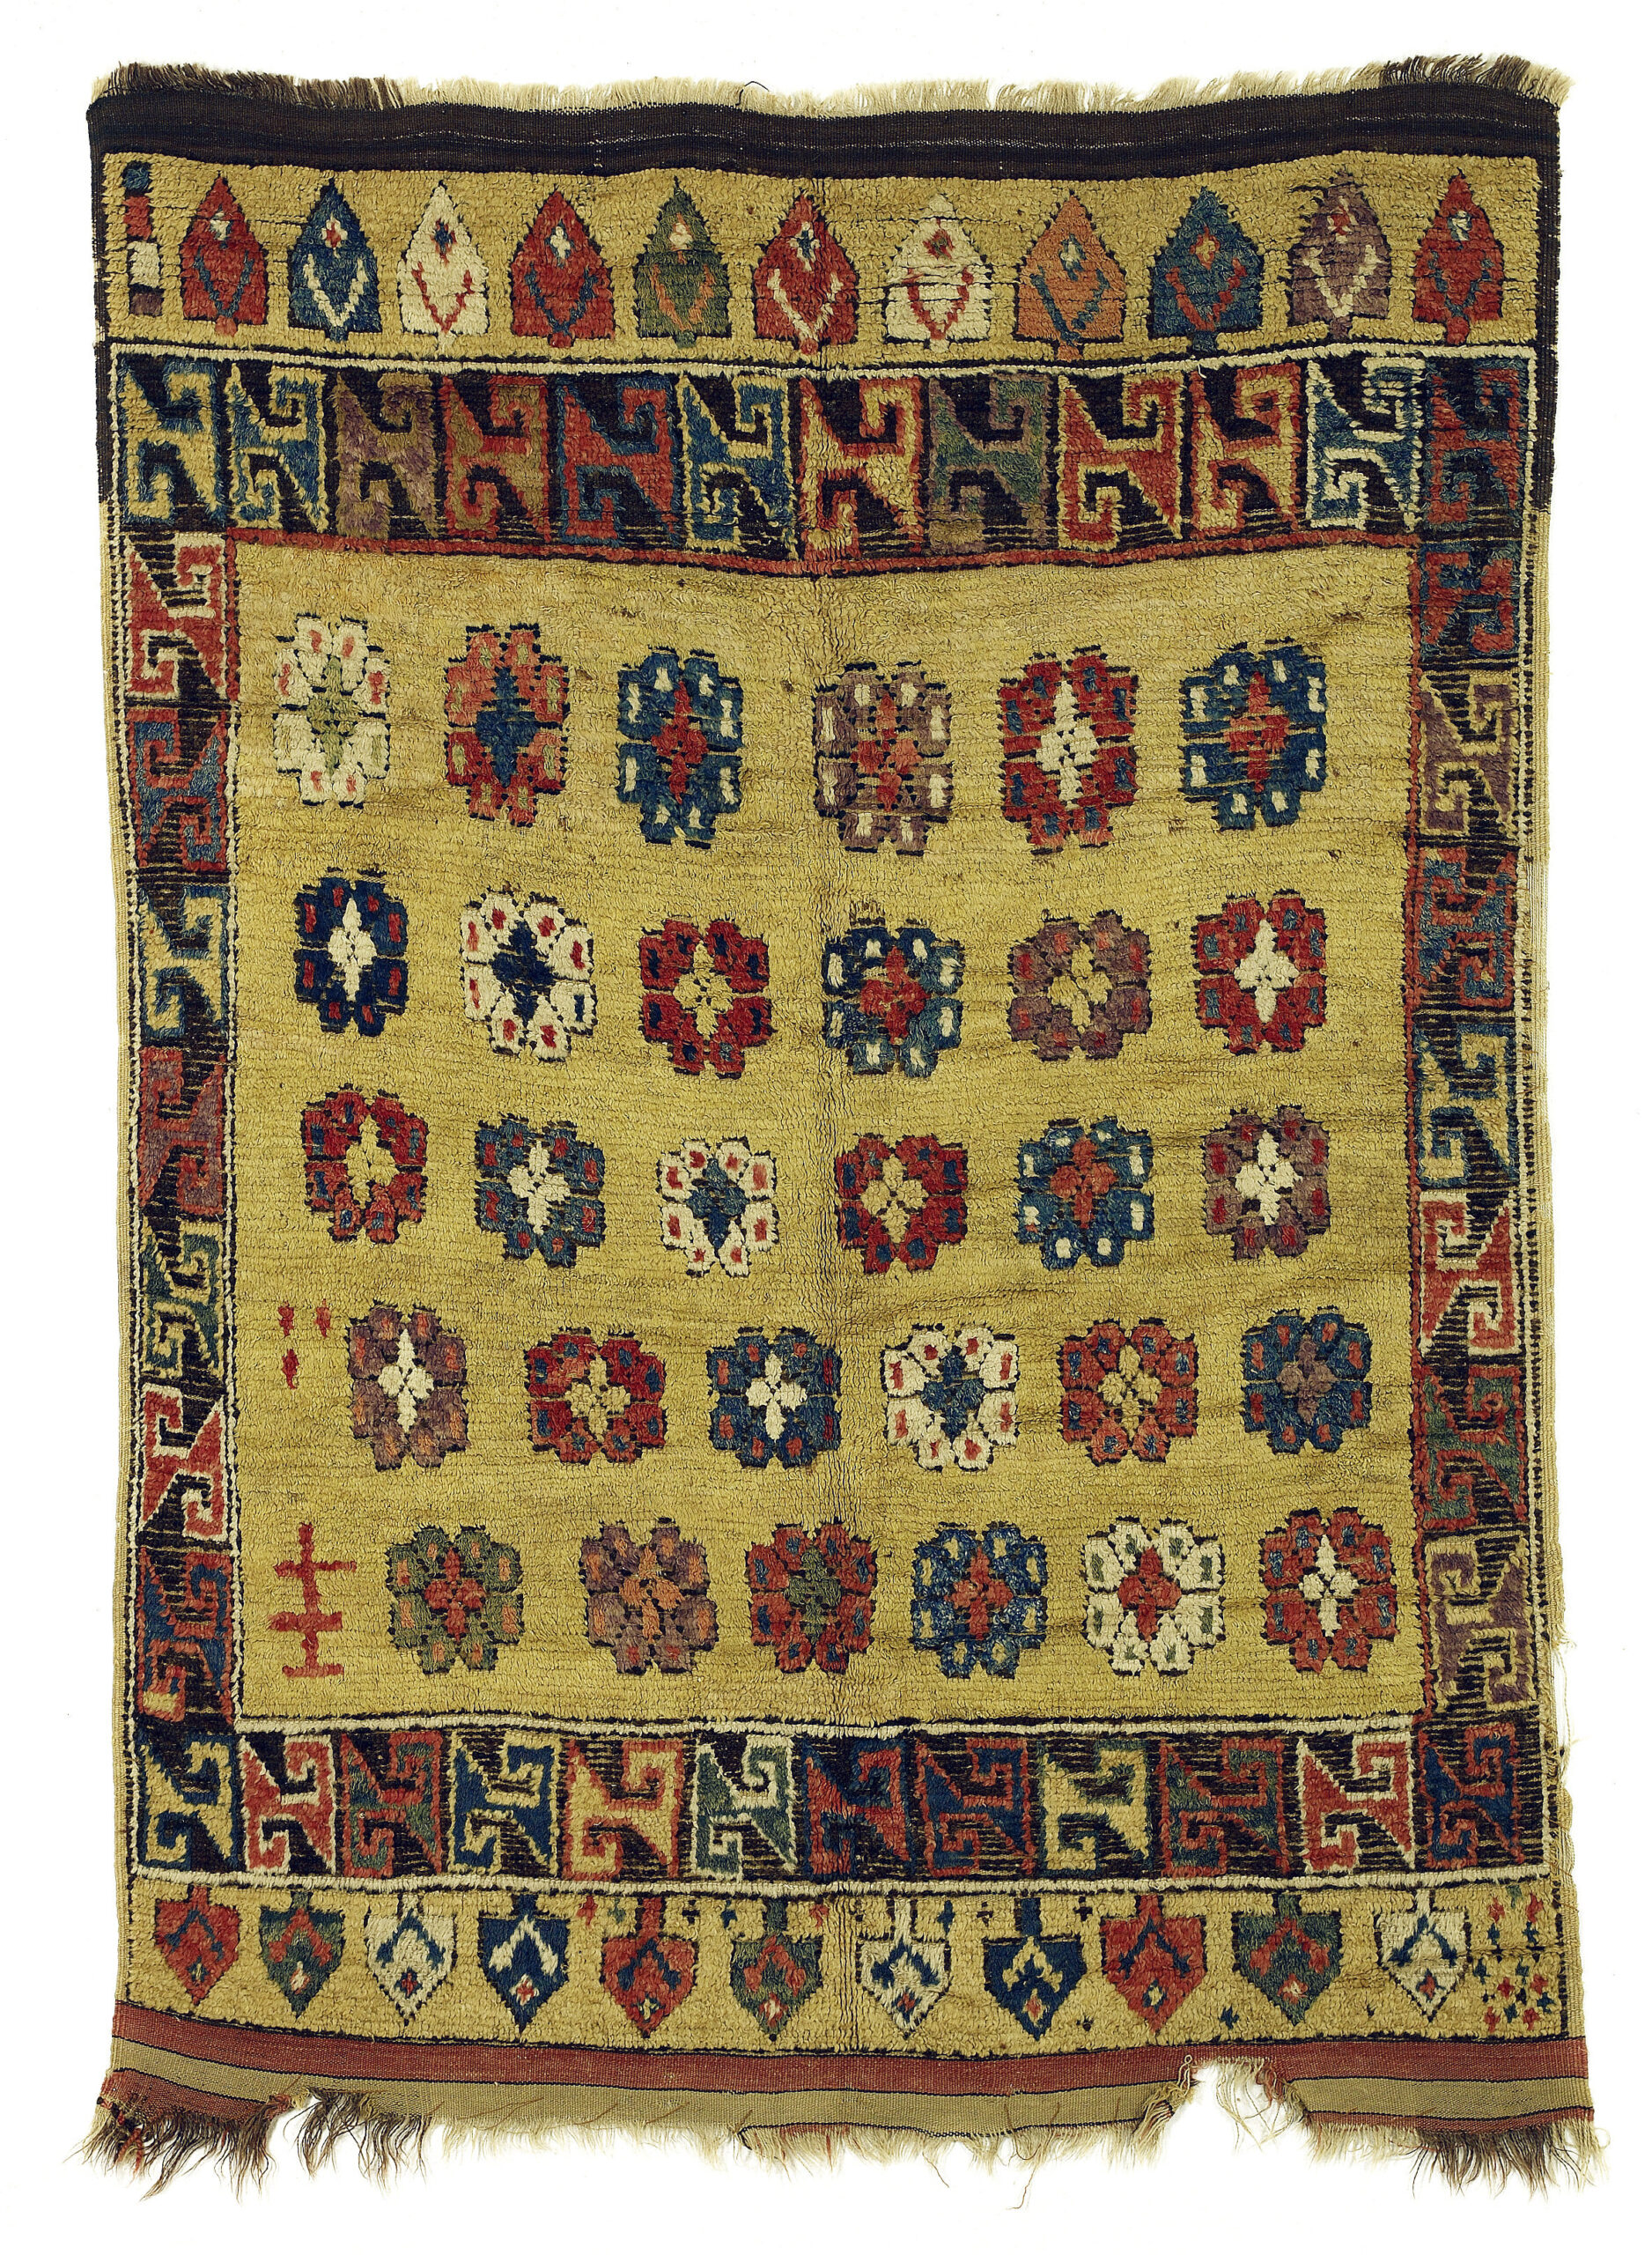 18th century yellow ground rug from Cappadocia, Central Turkey